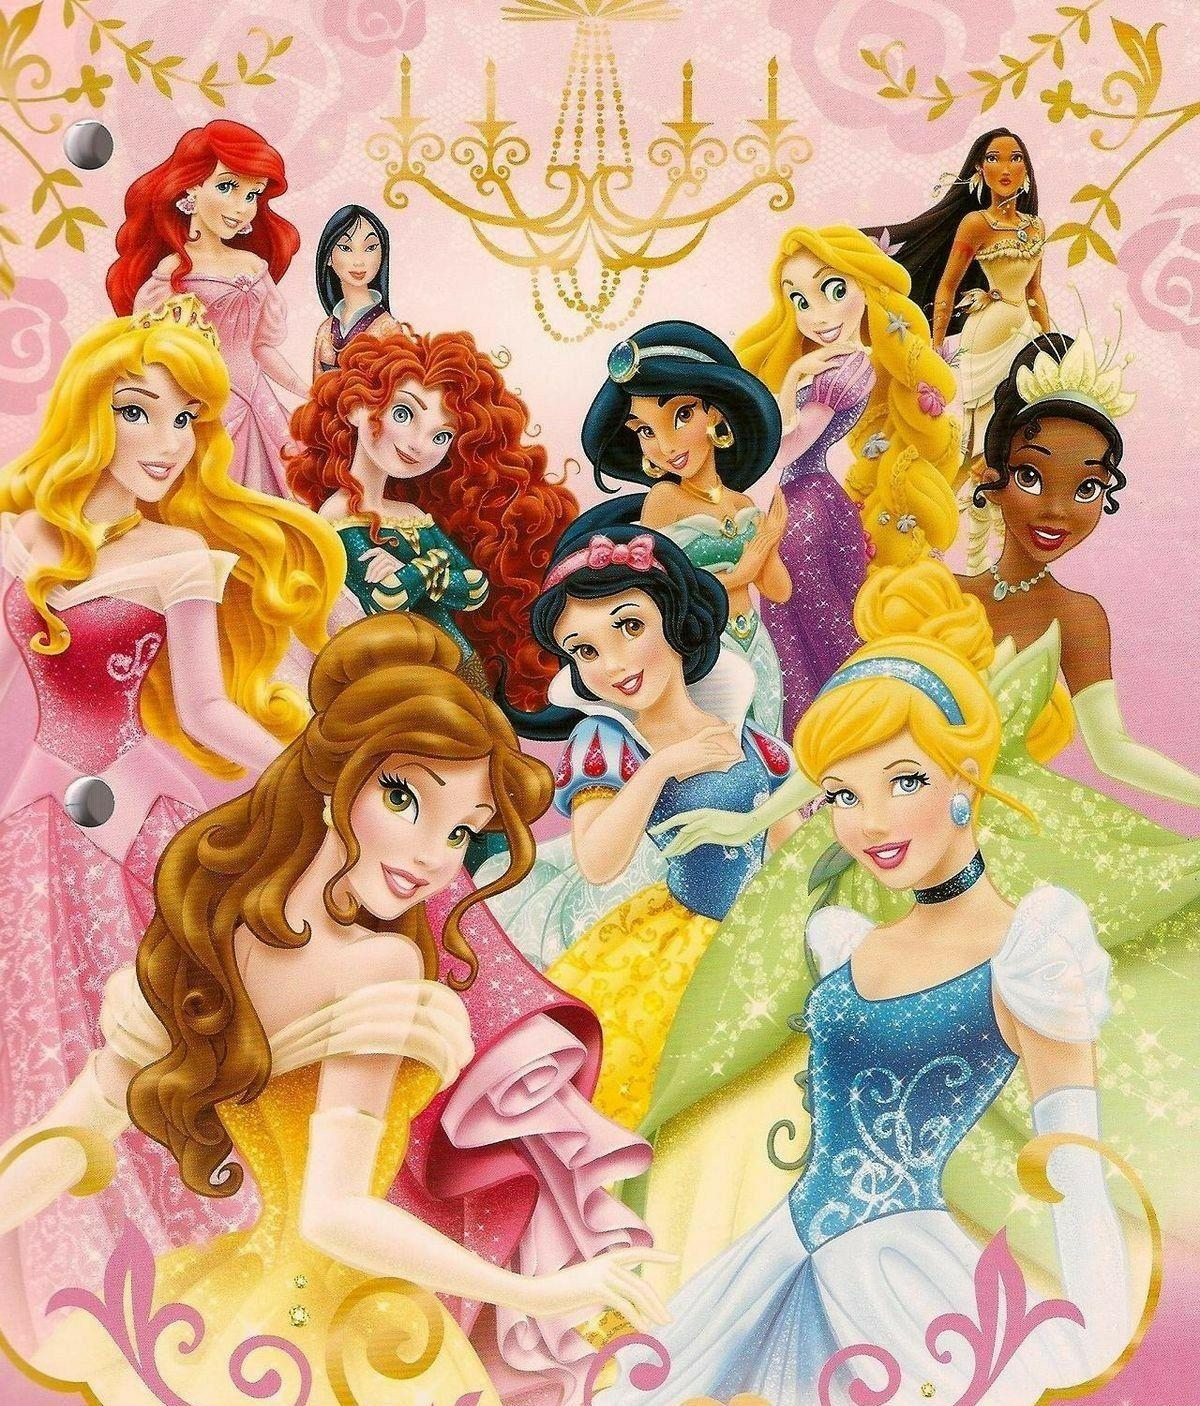 Ariel Aurora Merida Jasmine Rapunzel Pocahontas Tiana Belle Snow White Cinderel Disney Princess Pictures Disney Princess Art Disney Princess Wallpaper